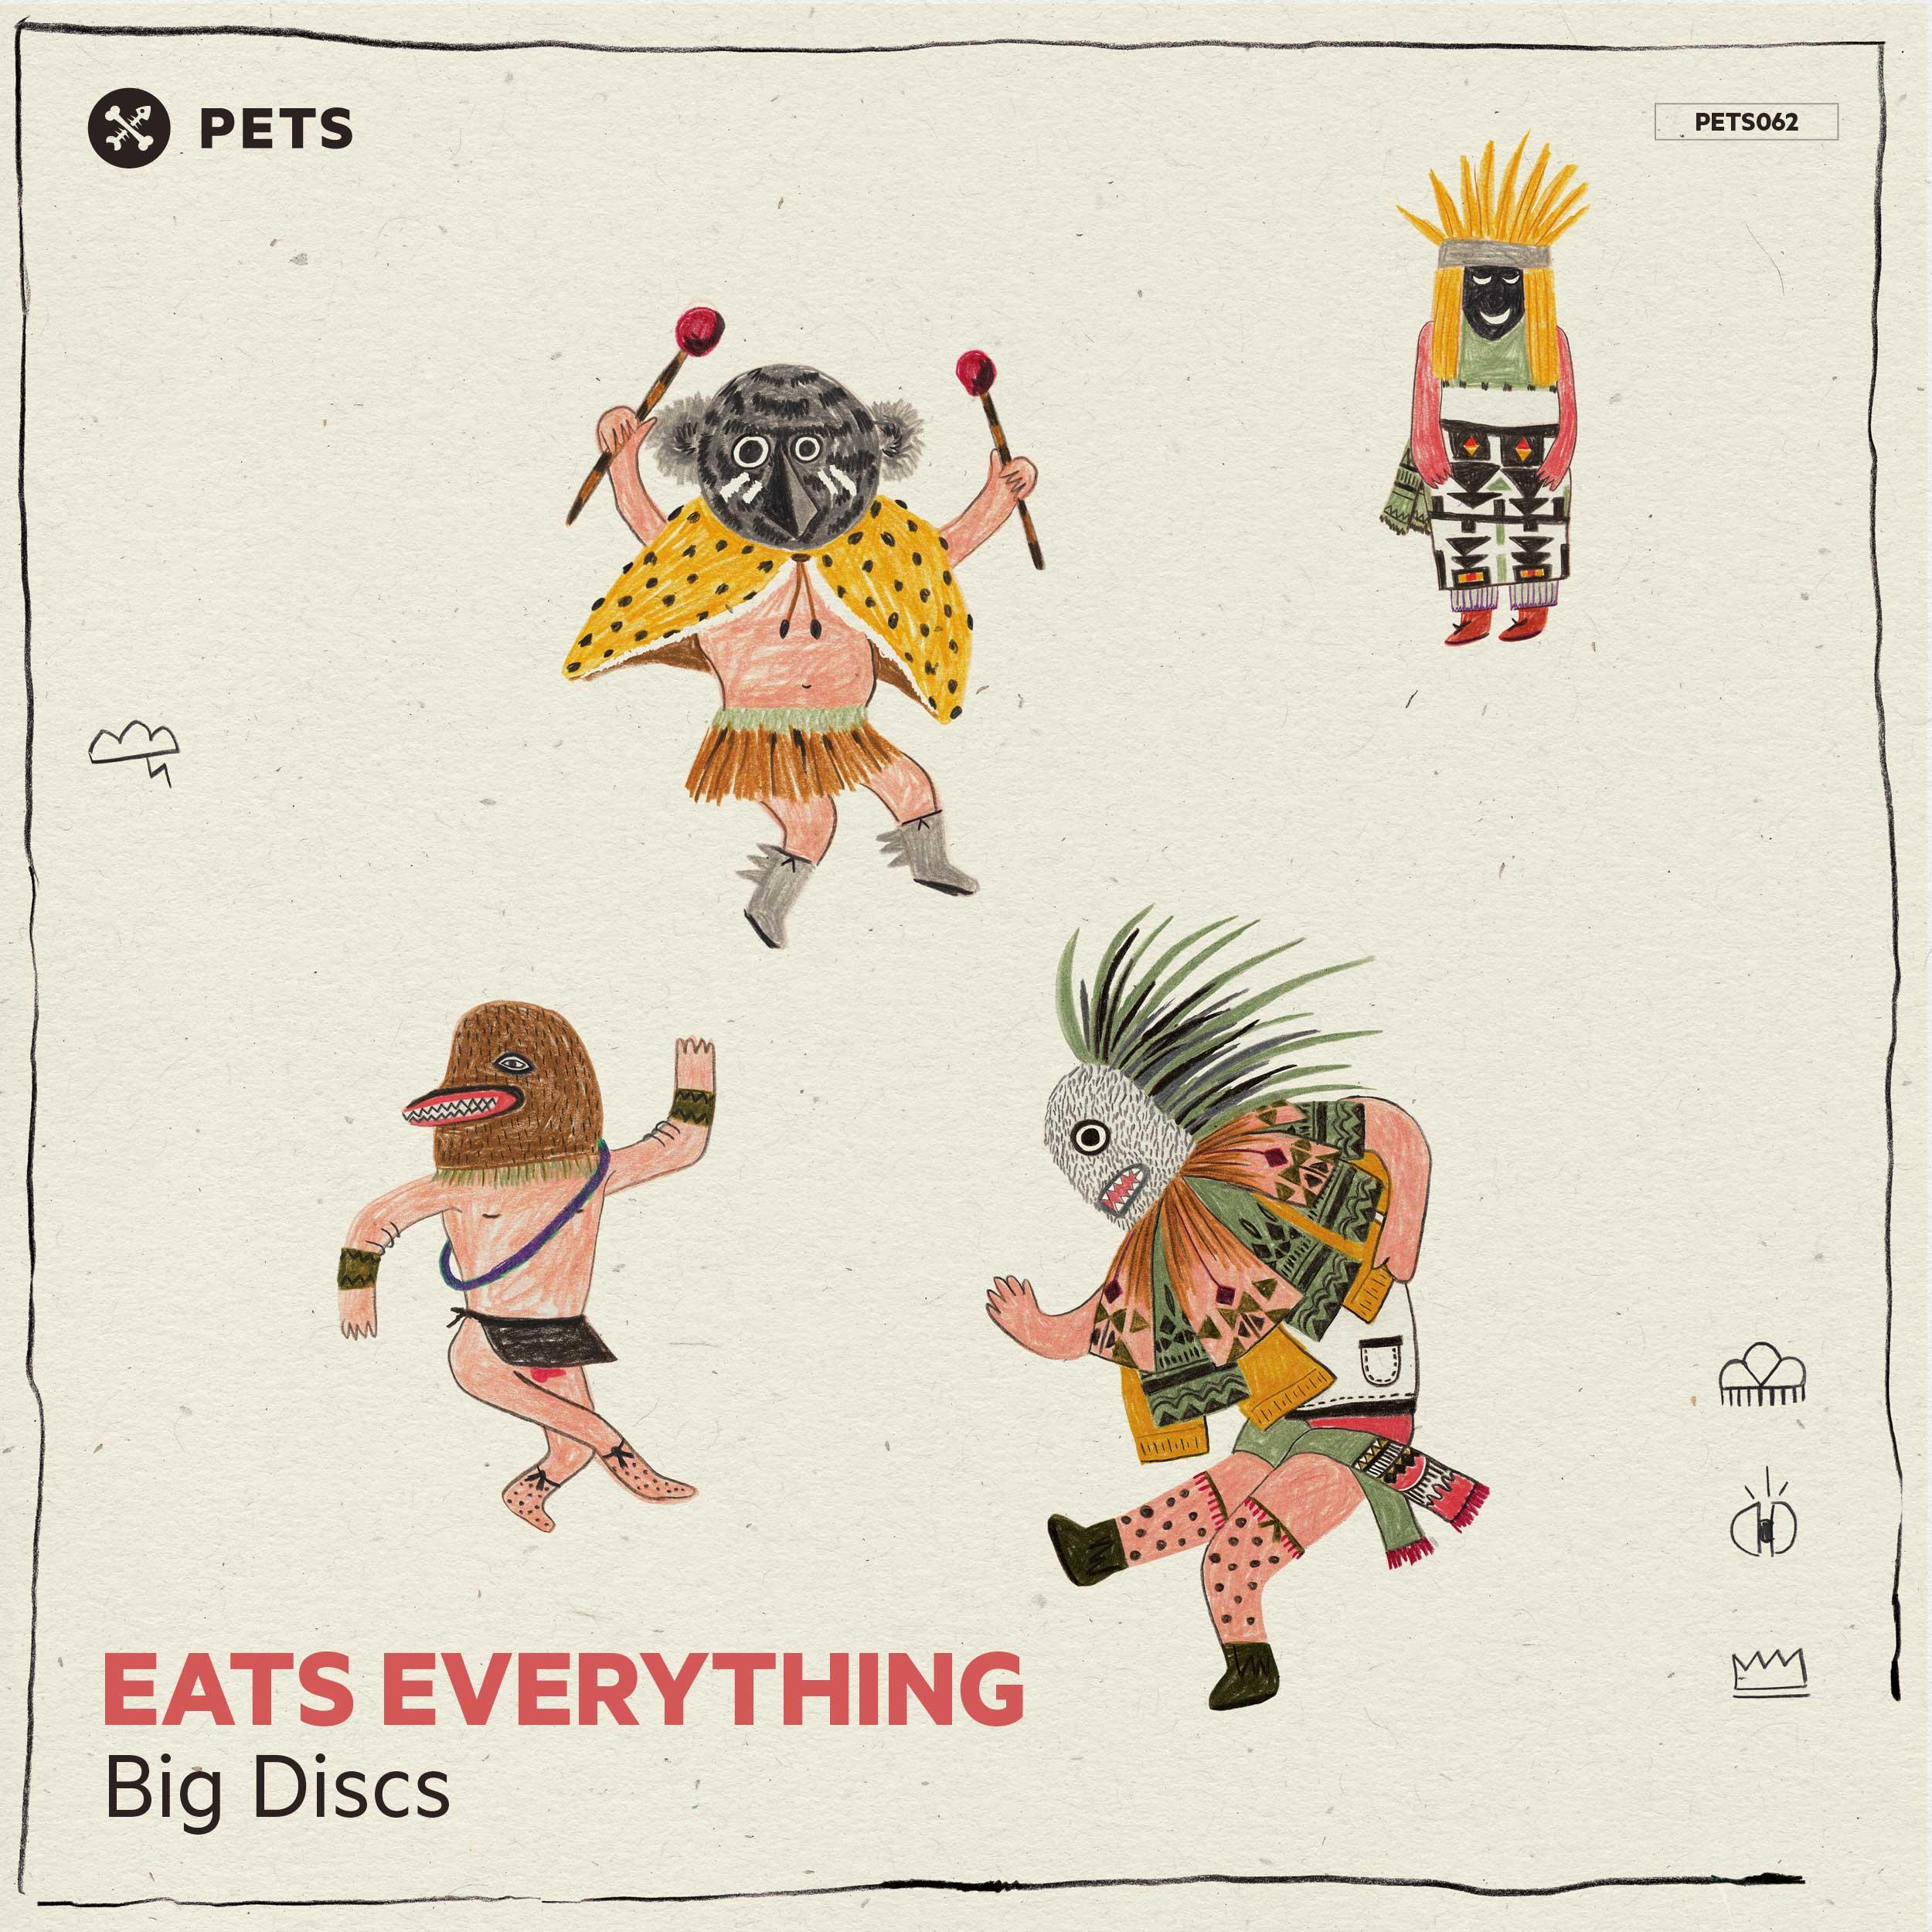 Eats Everything - Big Discs EP [PETS062]